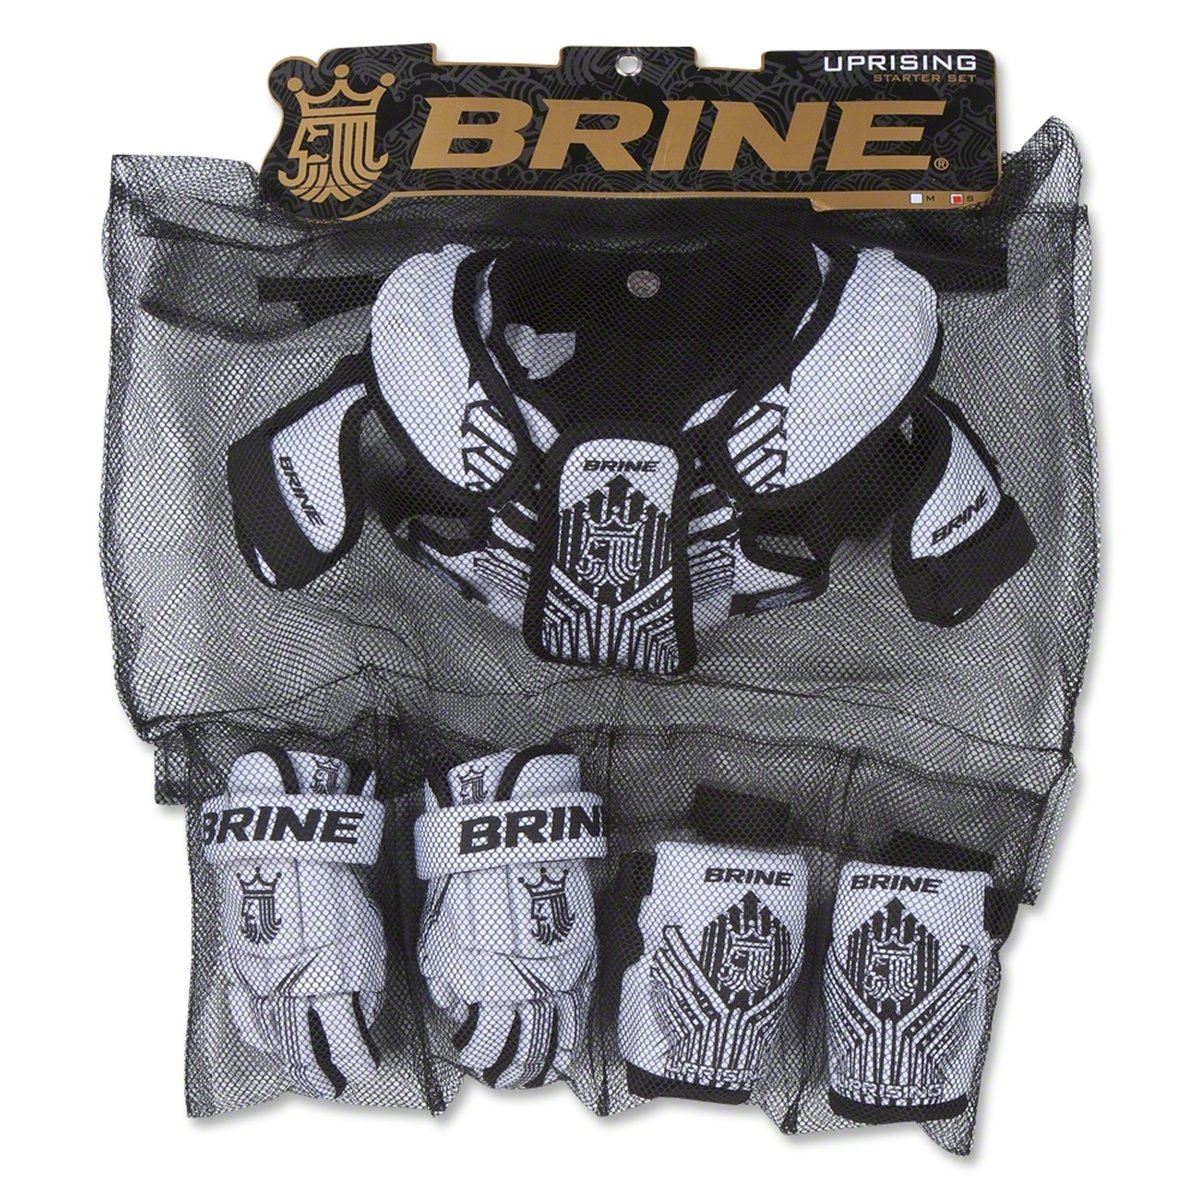 Brine Youth Uprising Starter Lacrosse Set